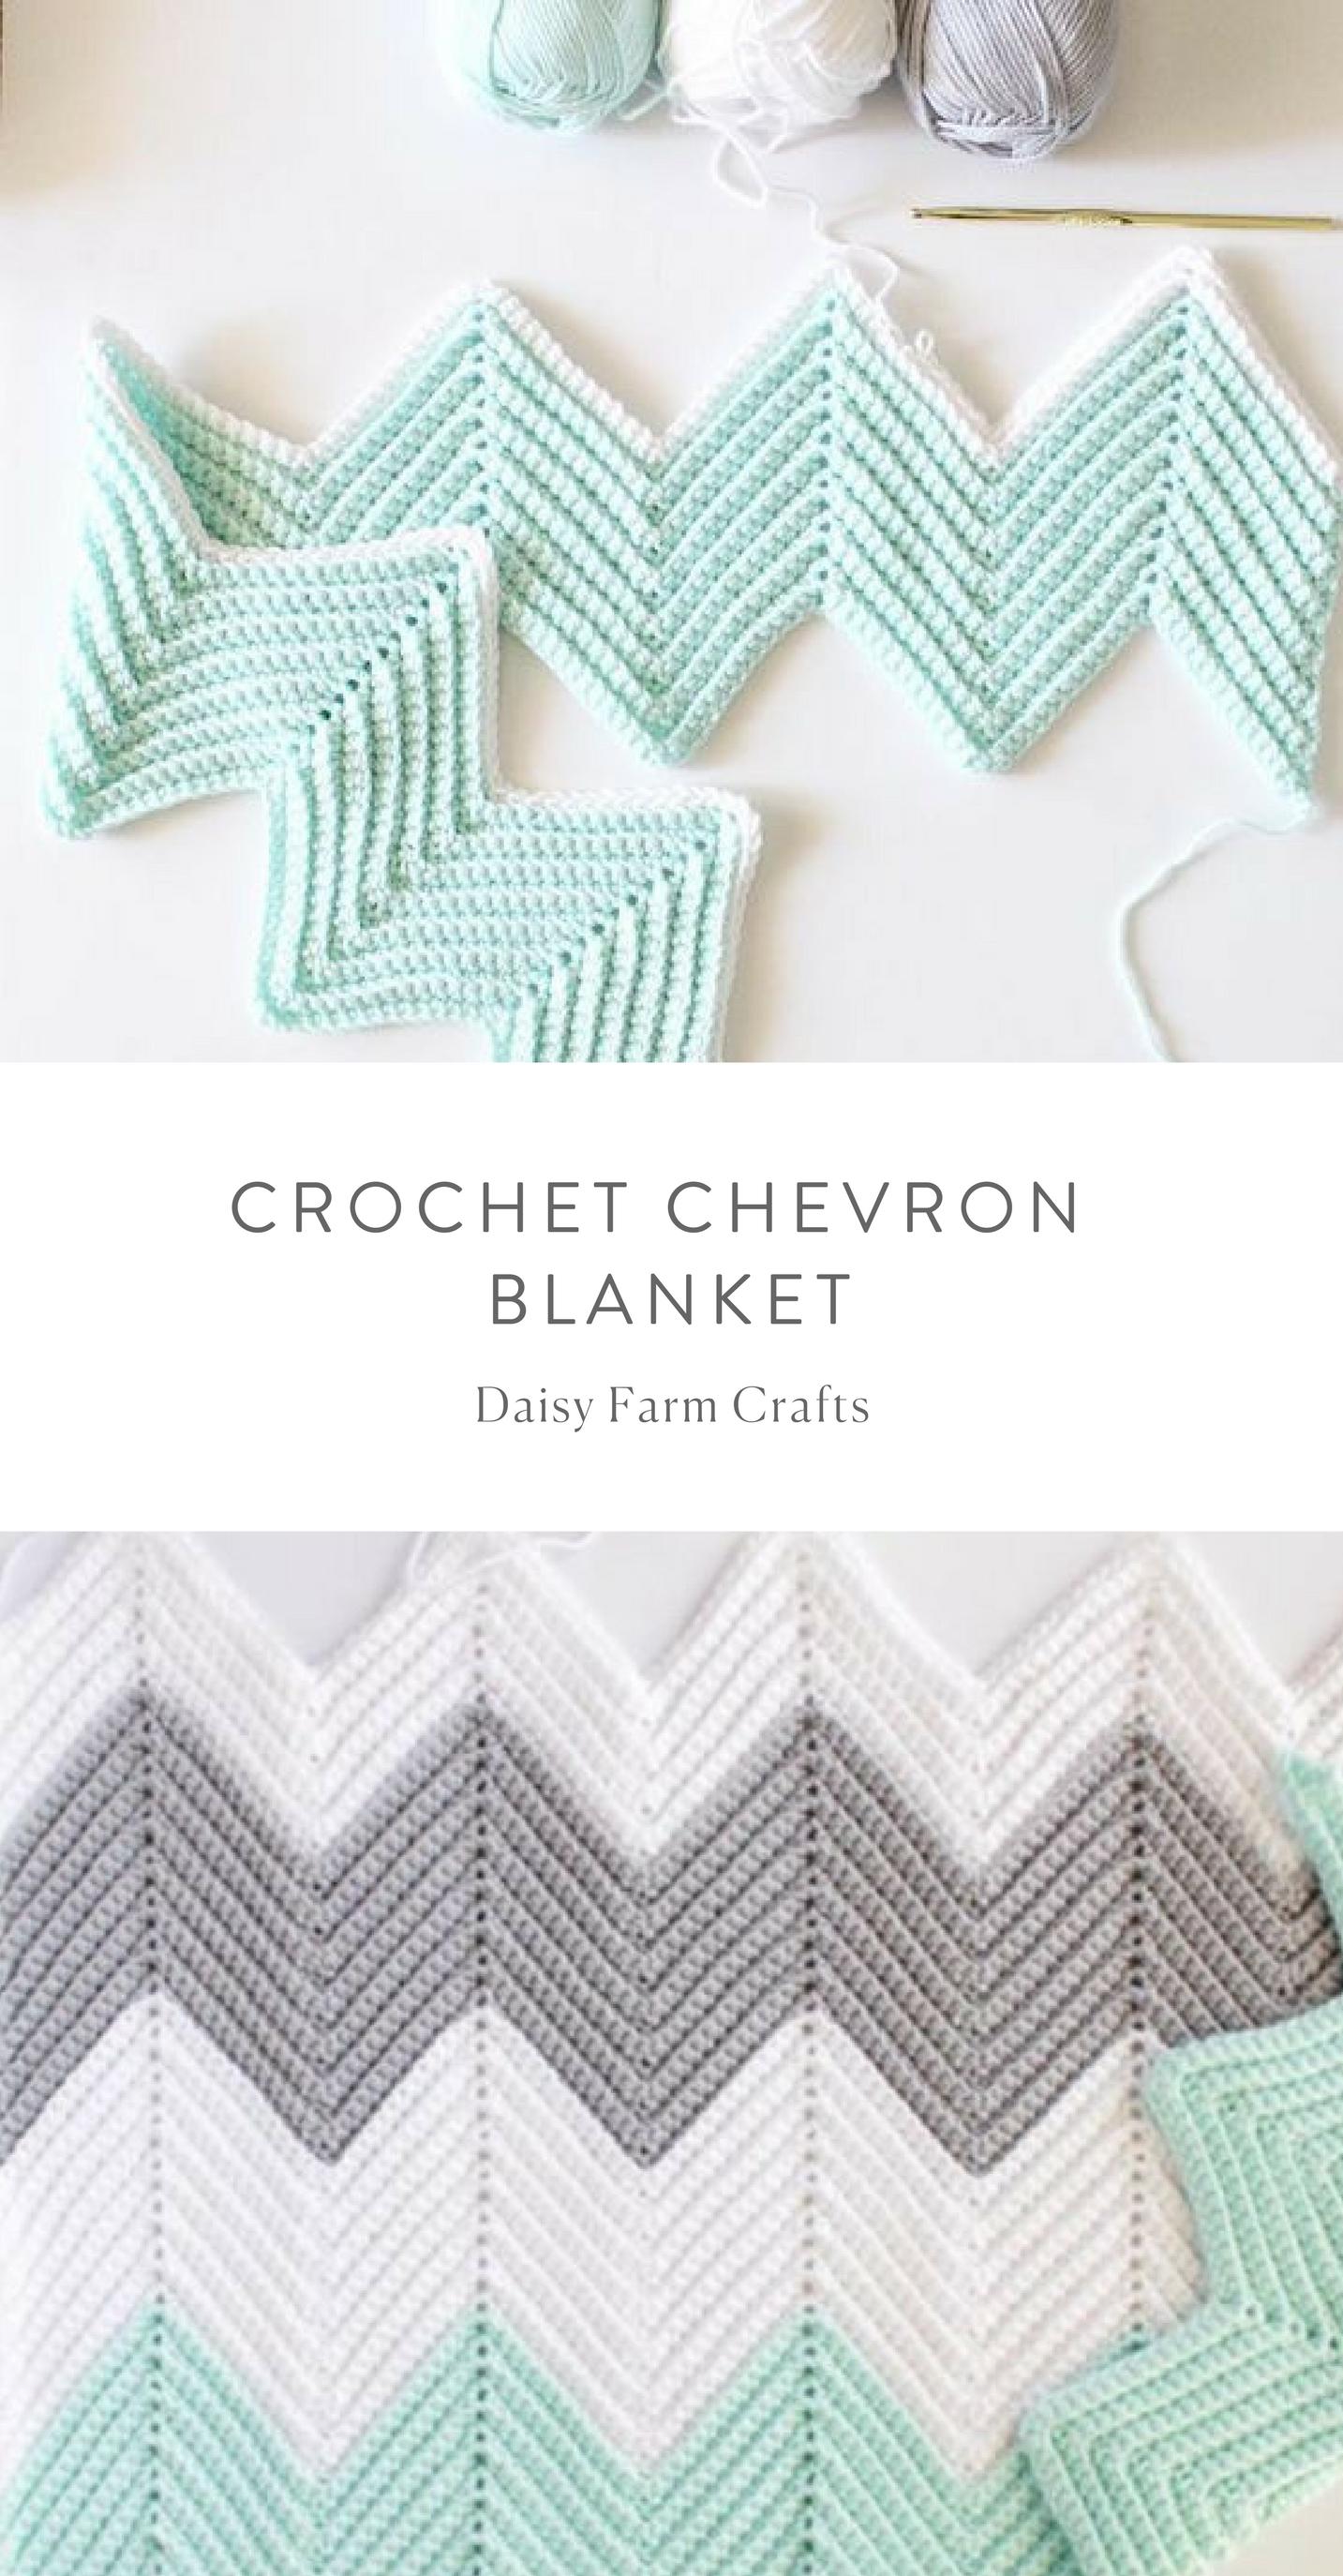 Free Pattern - Crochet Chevron Blanket | Mantas de bebe | Pinterest ...